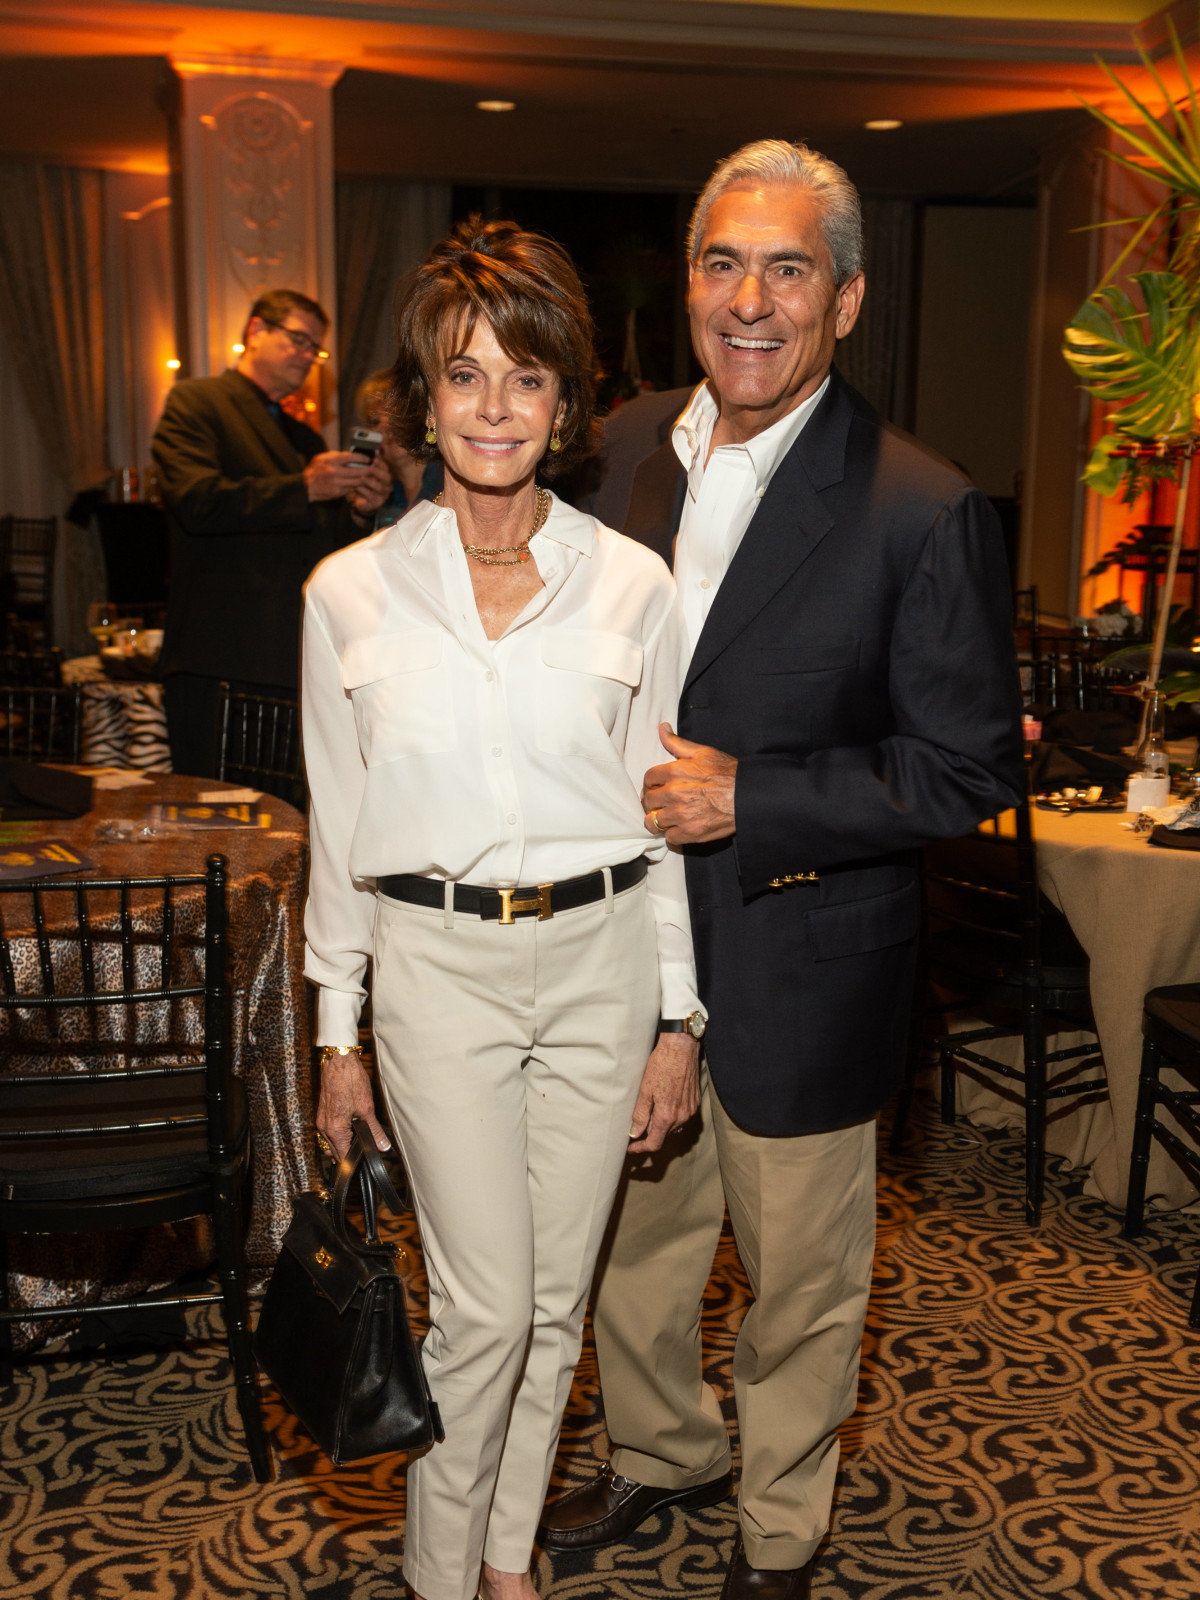 Be an Angel gala Joseph and Lisa Turano.jpg